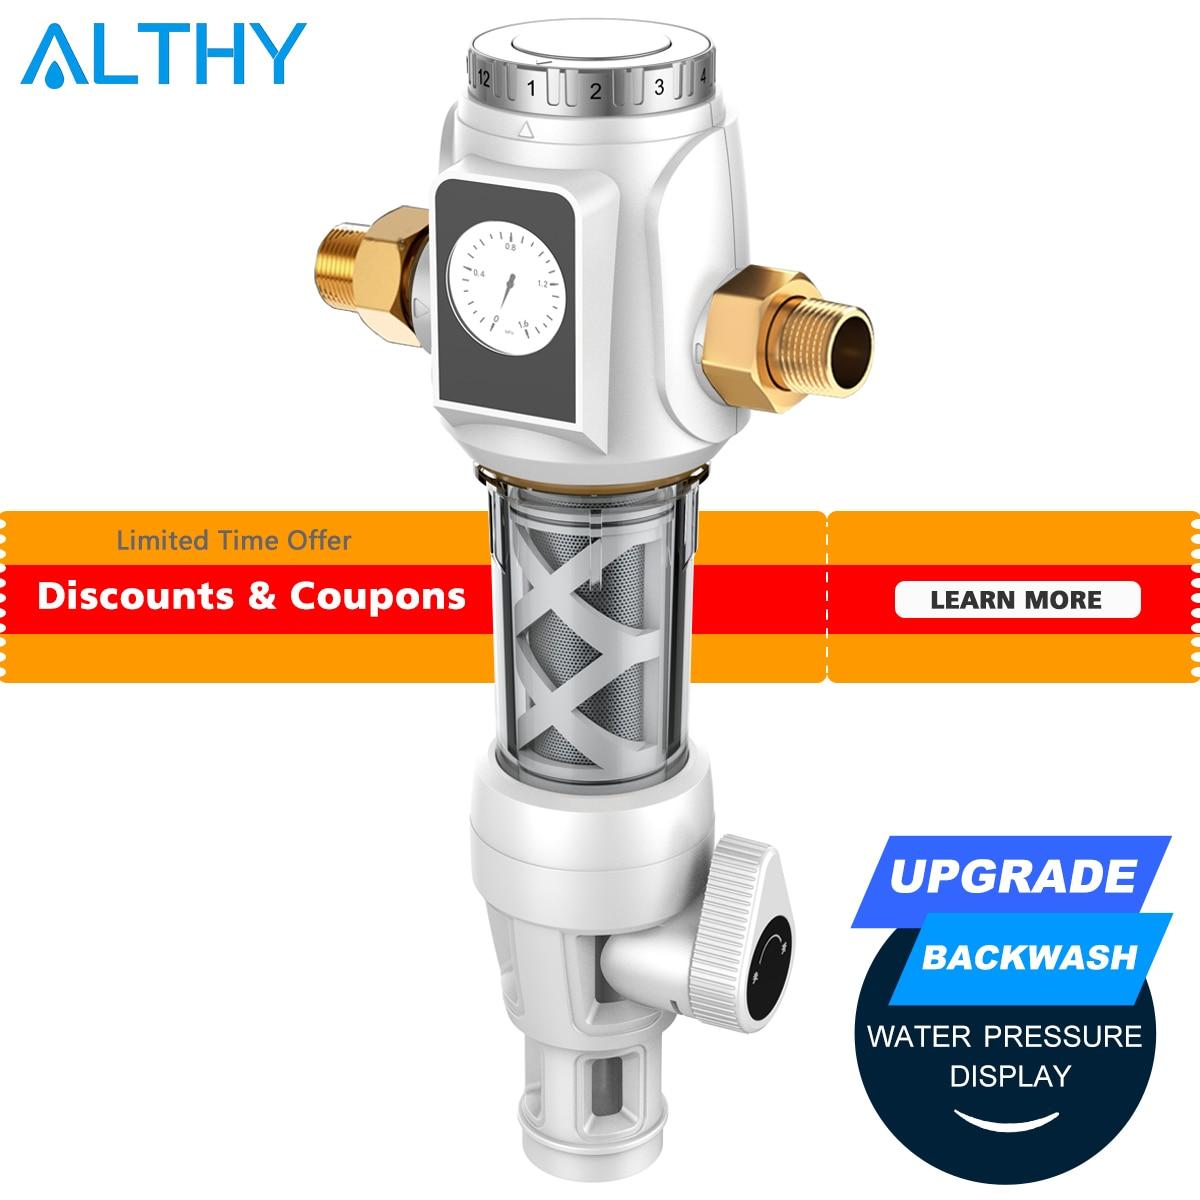 ALTHY Central Pre filter Whole House Pre-filter Water Filter Purifier Siphon backwash 3T/h 40μm double filter Pressure Gauge